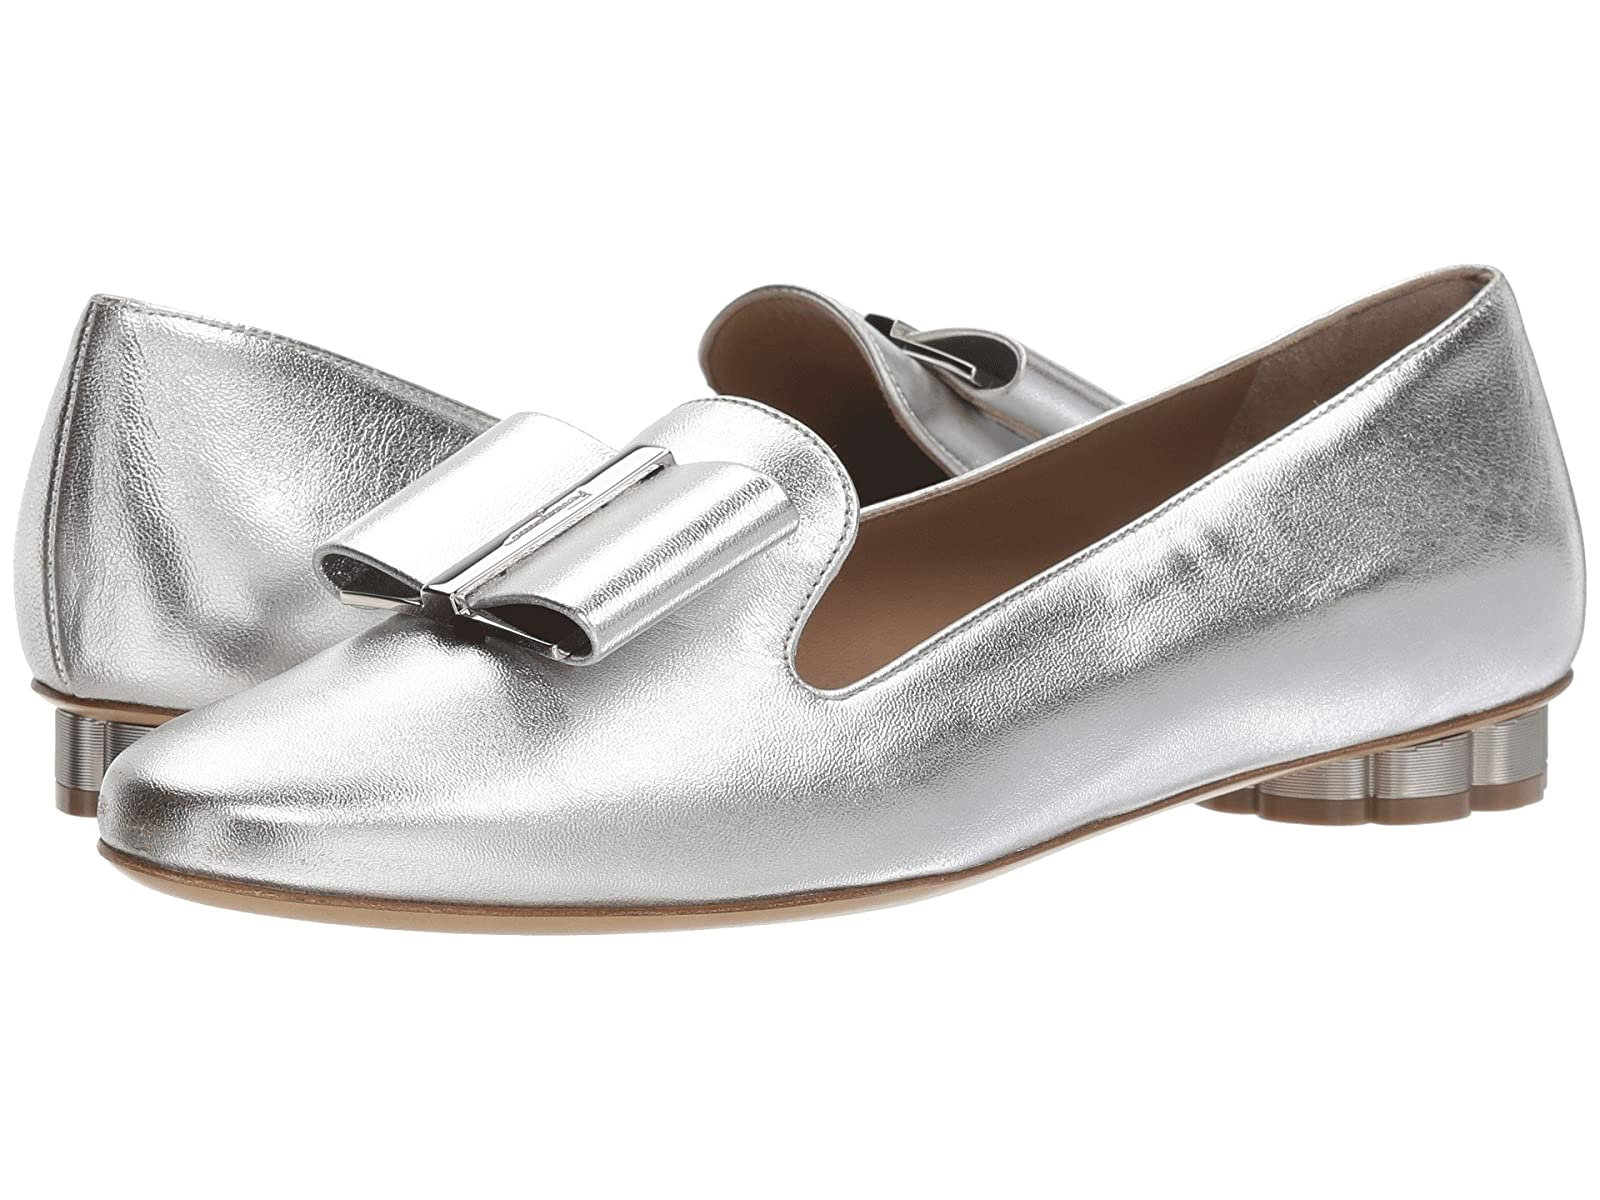 Salvatore Ferragamo SarnoCheap and distinctive eye-catching shoes